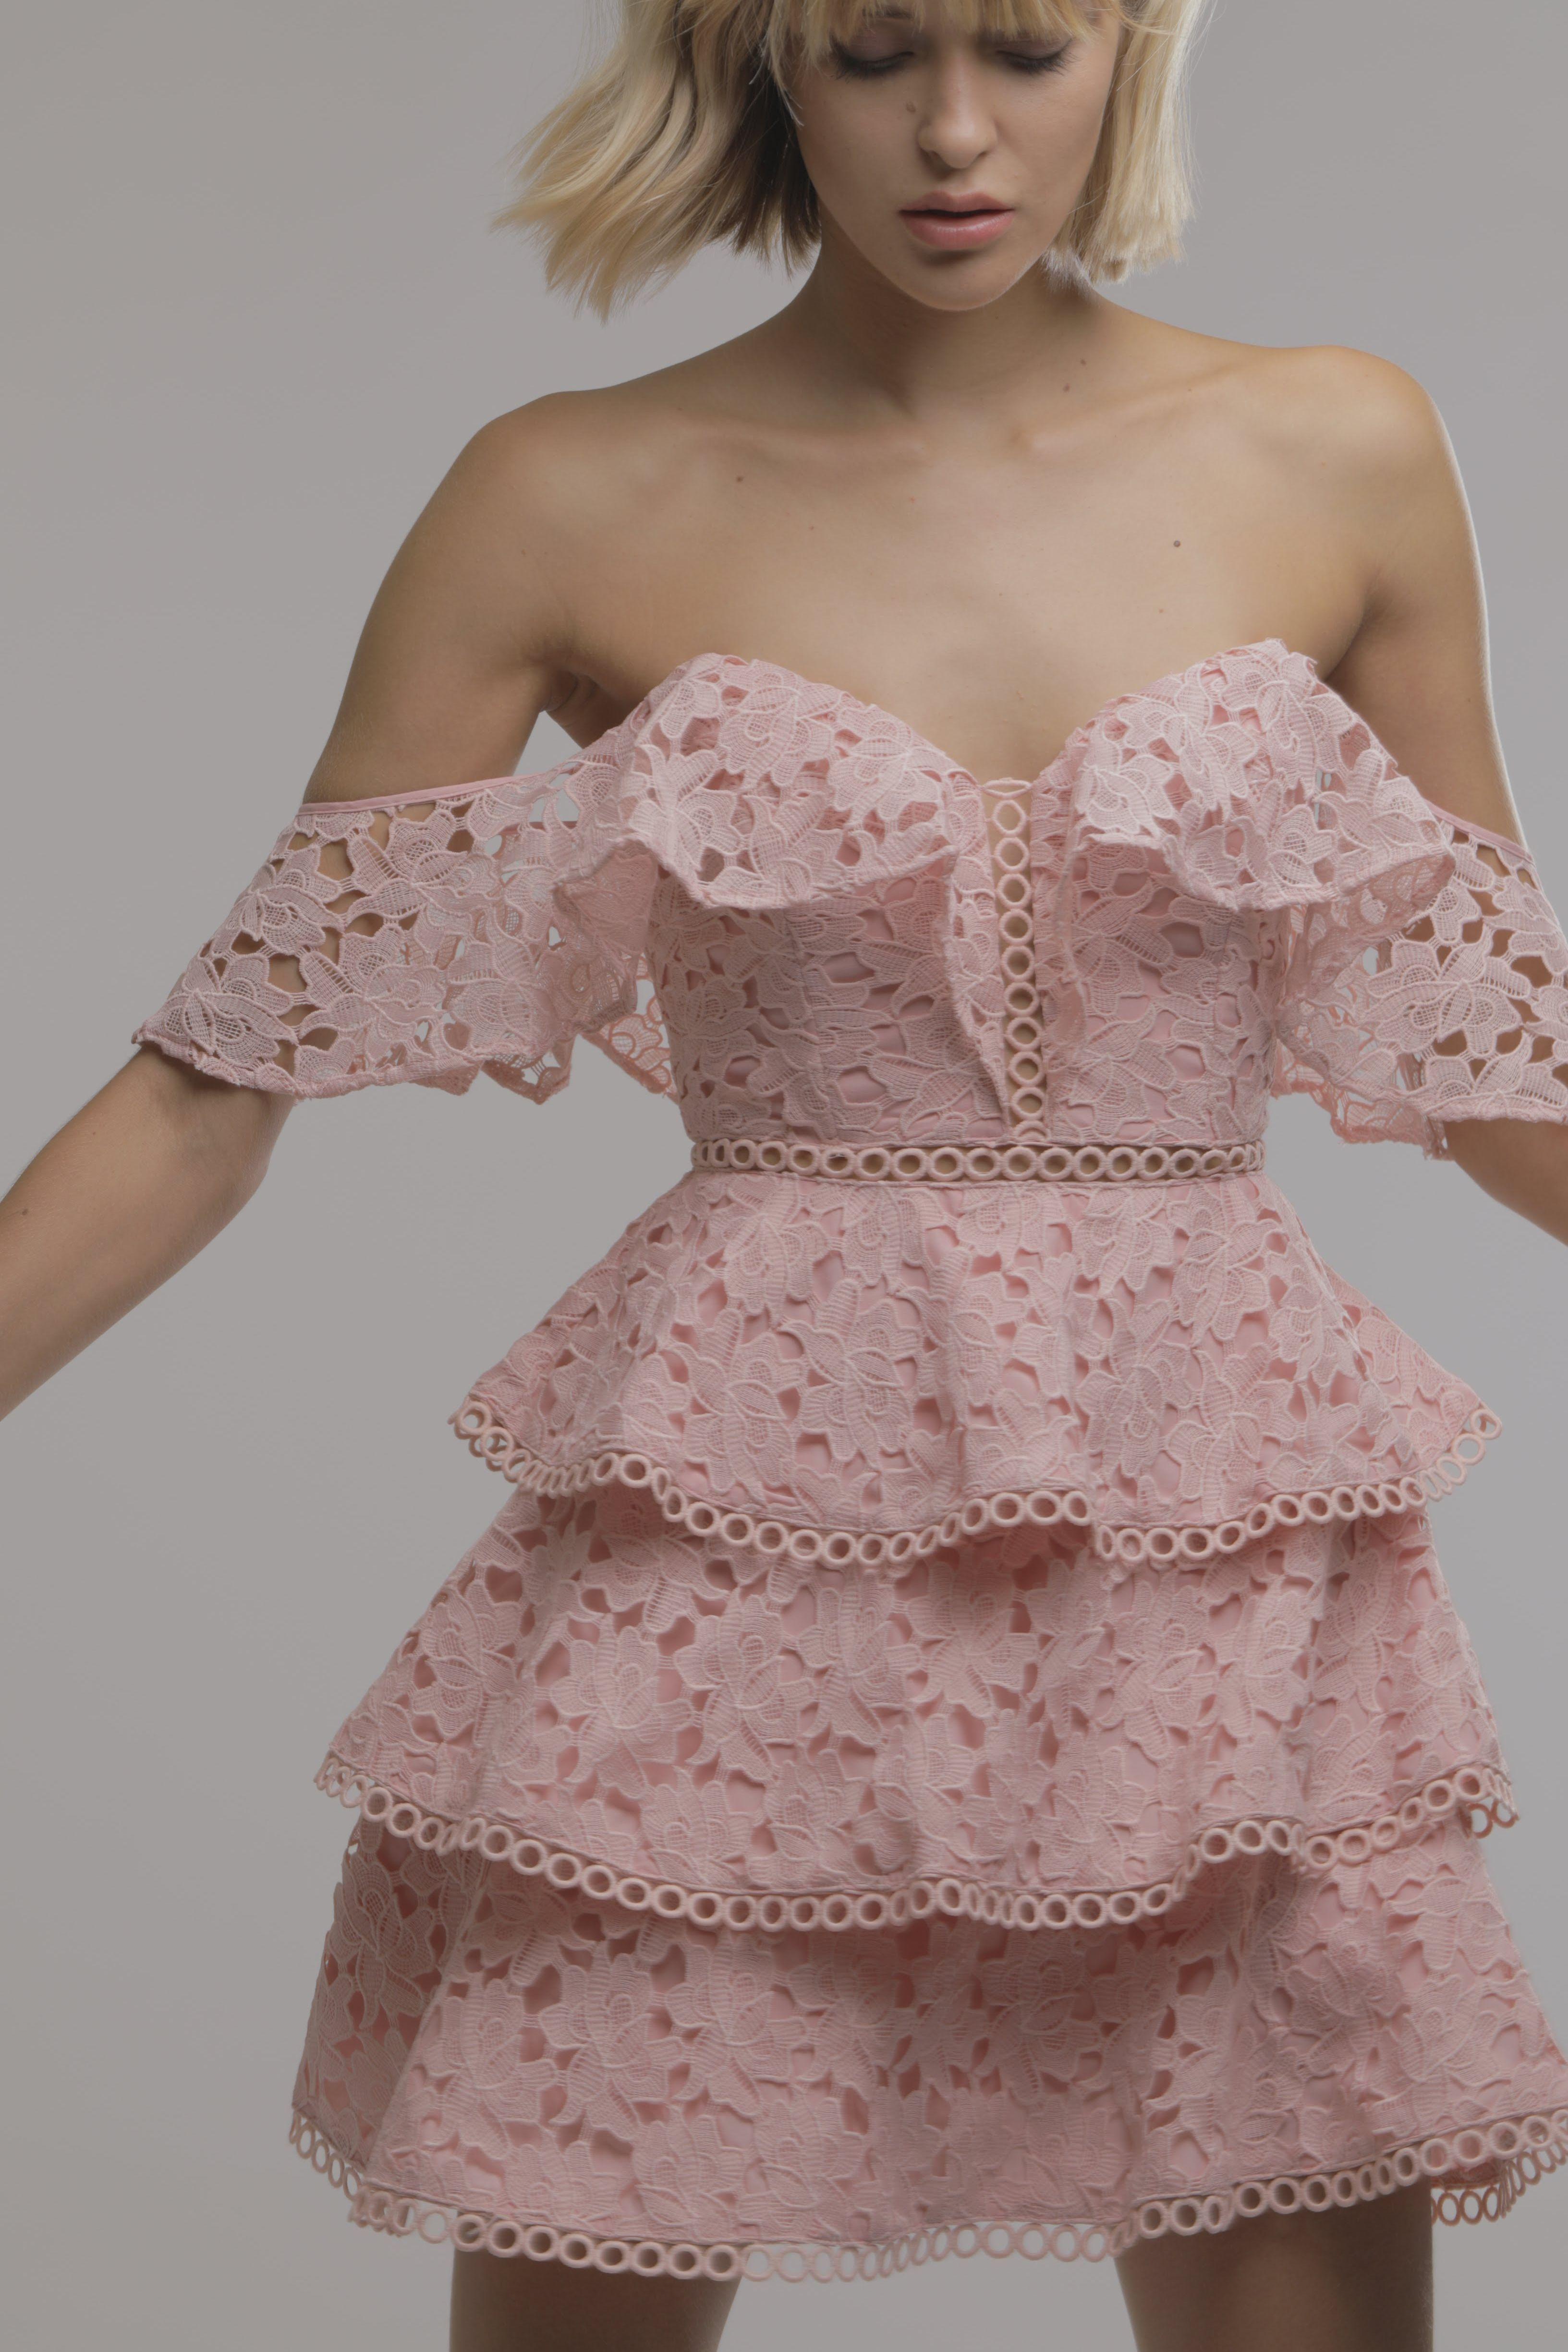 High knee converse how to wear, Inspiration: Fashion ruche spring flourish lookbook